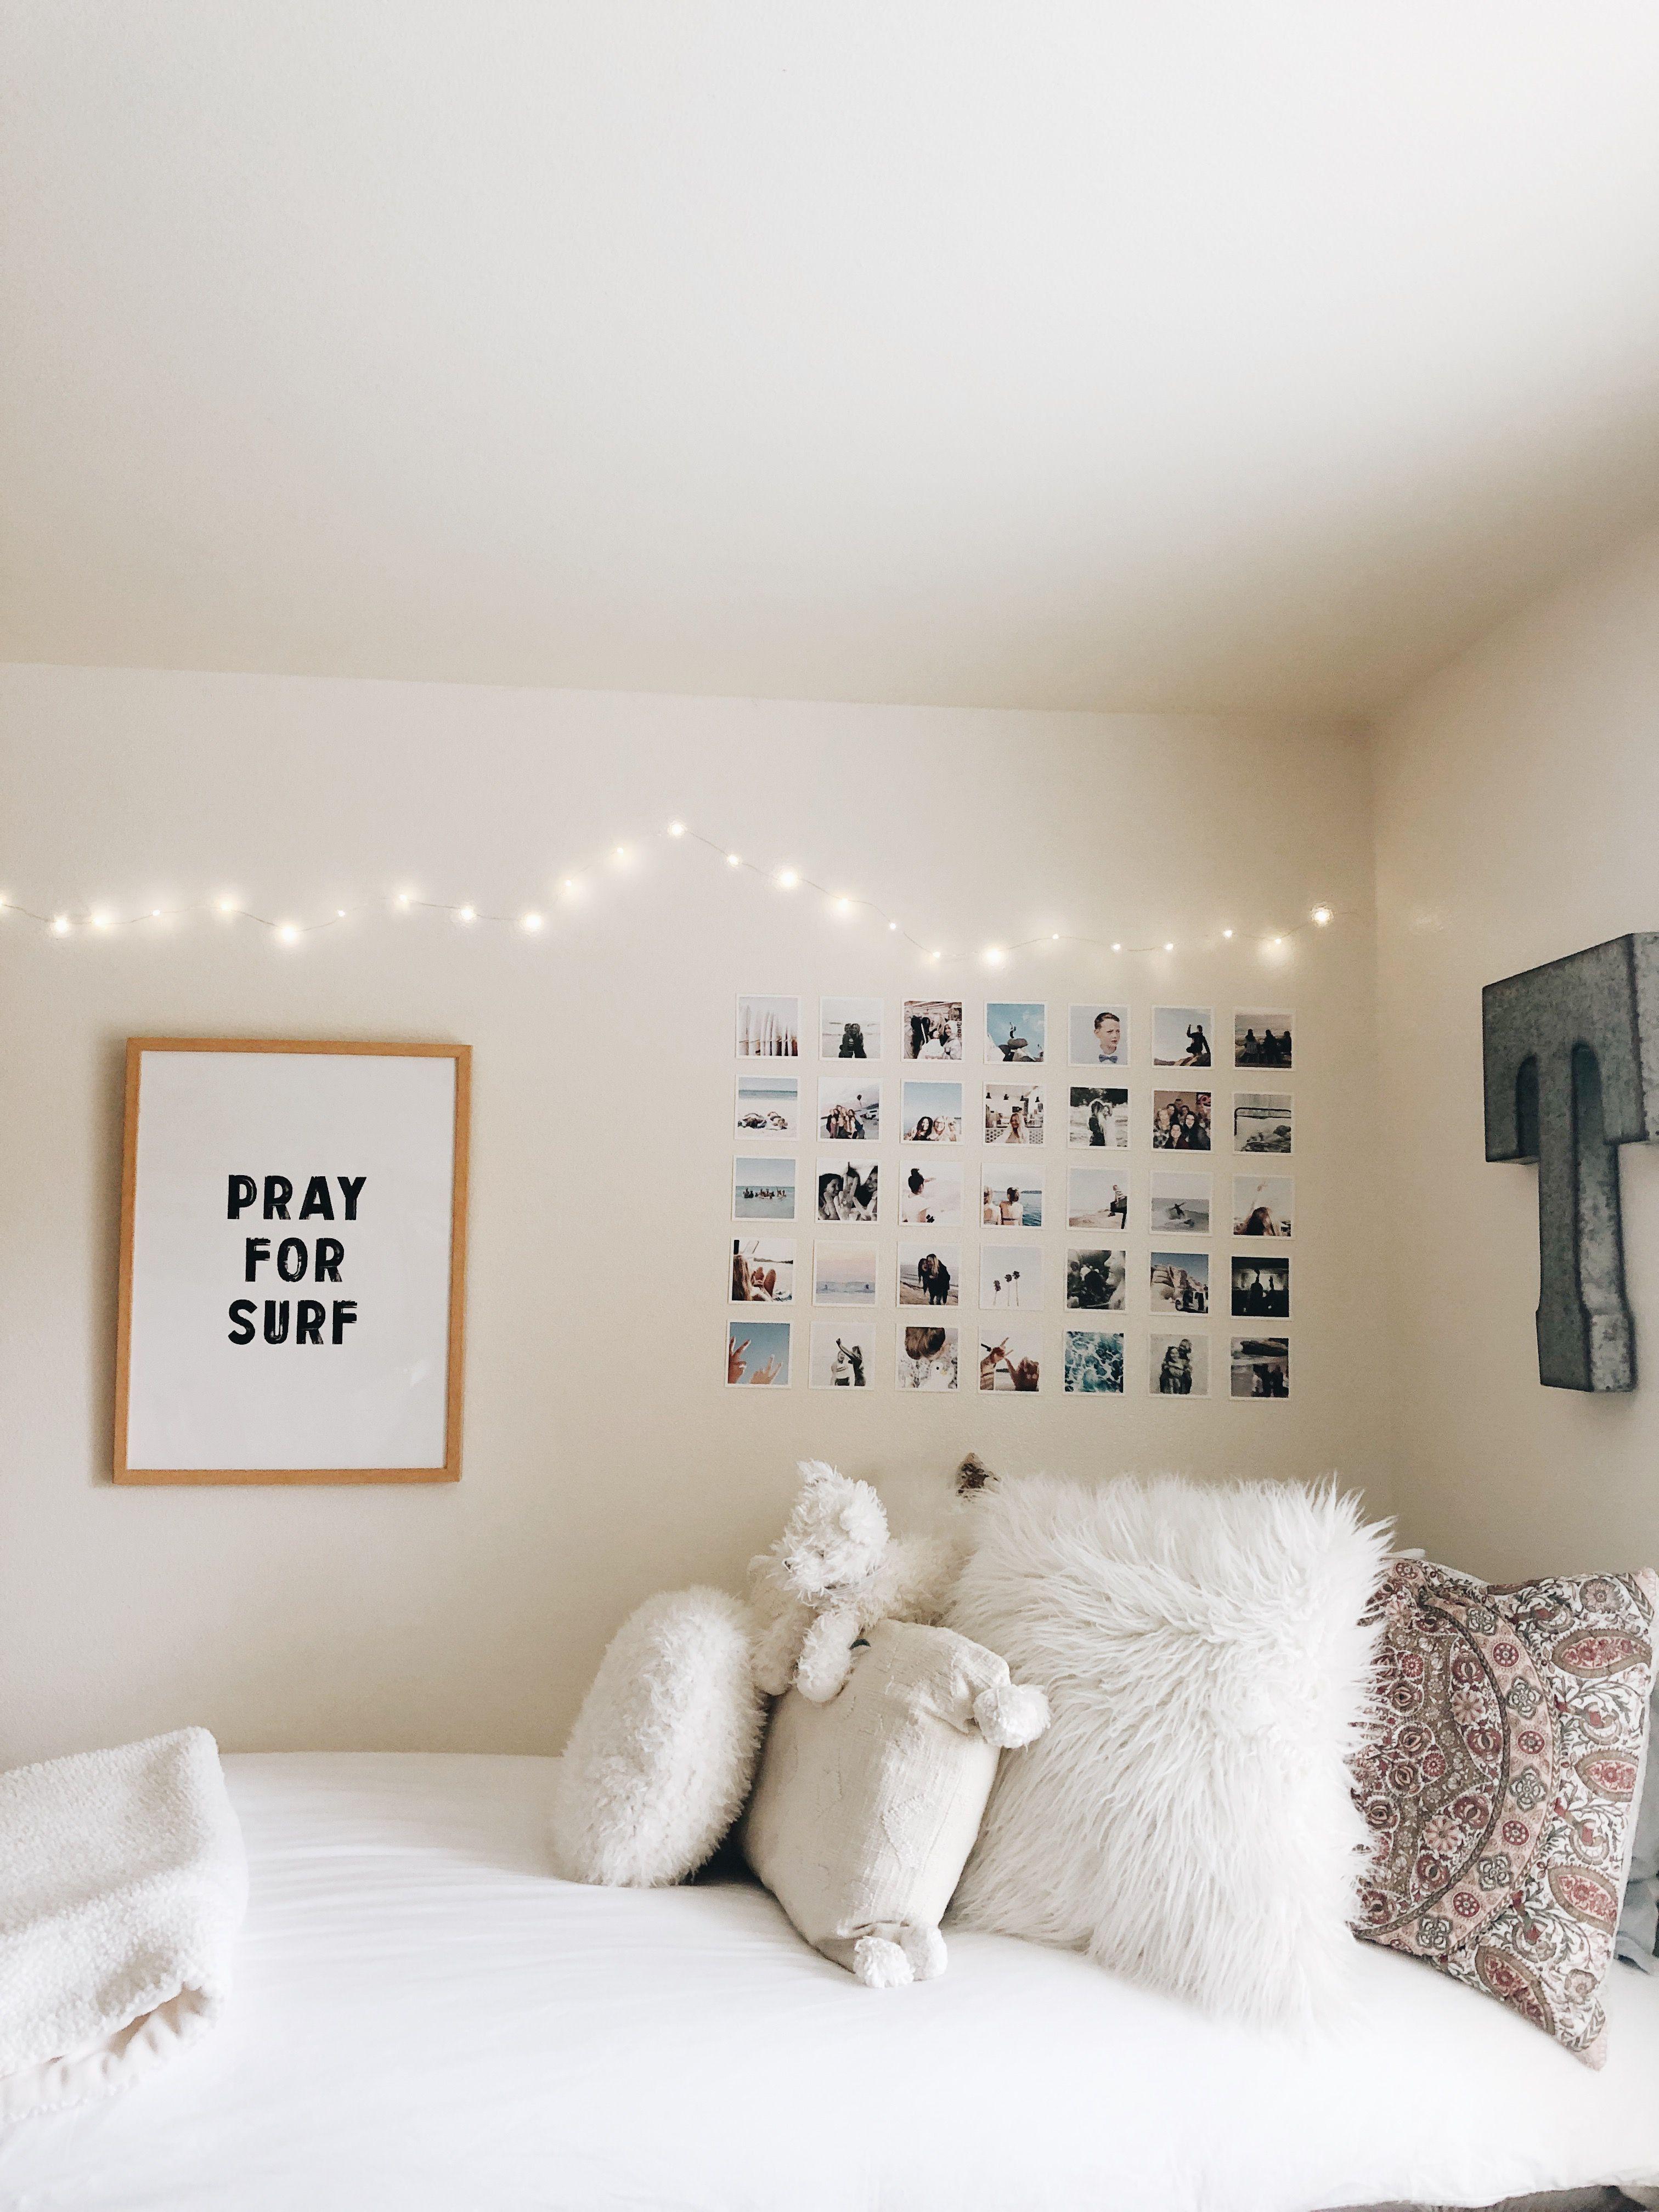 bedroom decor etsy #bedroom decor sets #10s bedroom decor #bedroom